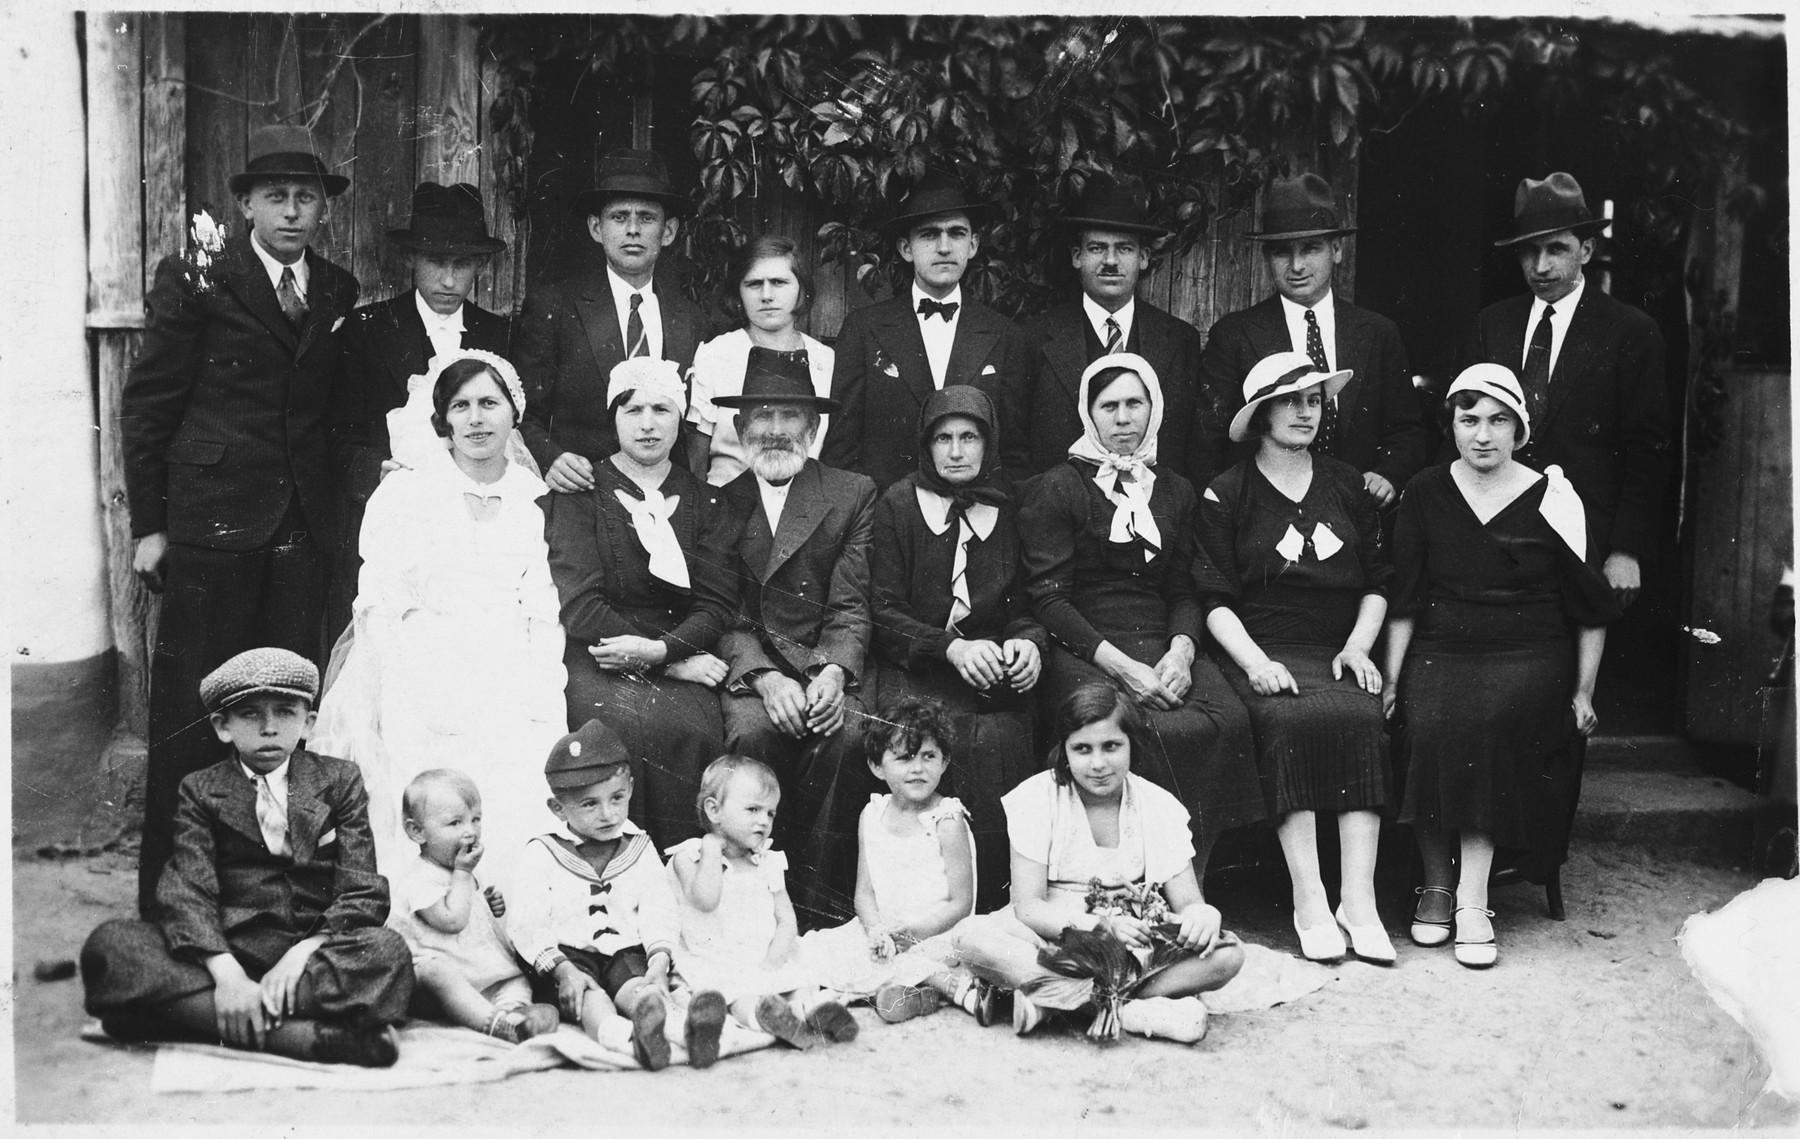 Relatives of the bride and groom pose for a family portrait at a Jewish wedding in Bilki.  Pictured in the front row from left to right: Zoltan Berger, Violet Mermelstein, Israel Mermelstein, Hana Mermelstein, Magda Mermelstein, and Eva Zocher.  Middle row:  Rezsi (Weisz) Berger (bride), Bela (Weisz) Mermelstein, Avruham Weisz, Henja Rochel Weisz, Sura Berger, Rozsi Zocher, Raizel (?).  Top row: Sanye,  Aaron Berger (groom), Ludwig Mermelstein, Choli Weisz, Samu Berger, Samu Zocher and Lajos Weisz.